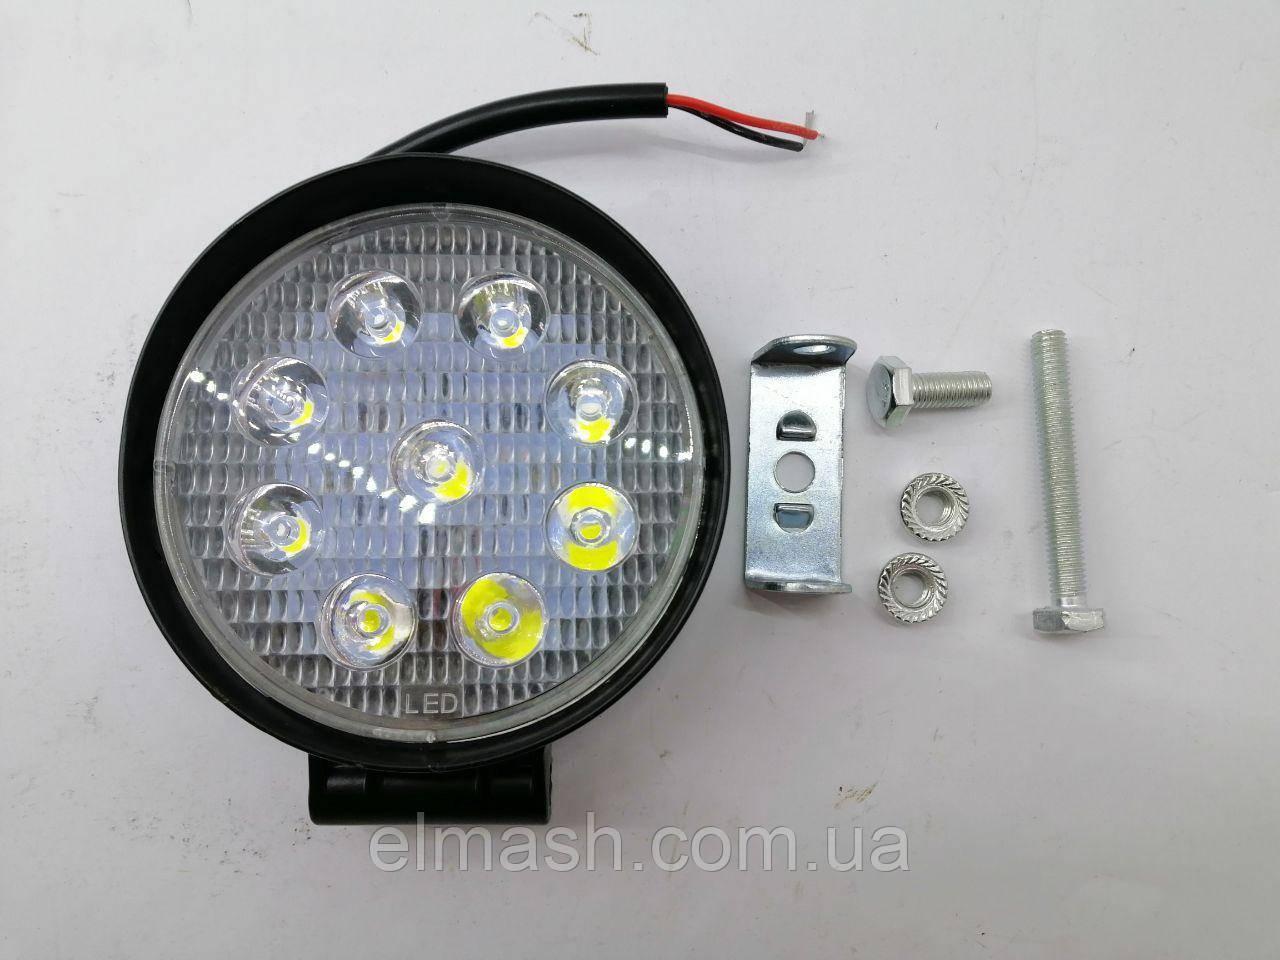 Фара LED кругла 27W, 9 ламп, 110 * 128мм СТАНДАРТ <ДК>